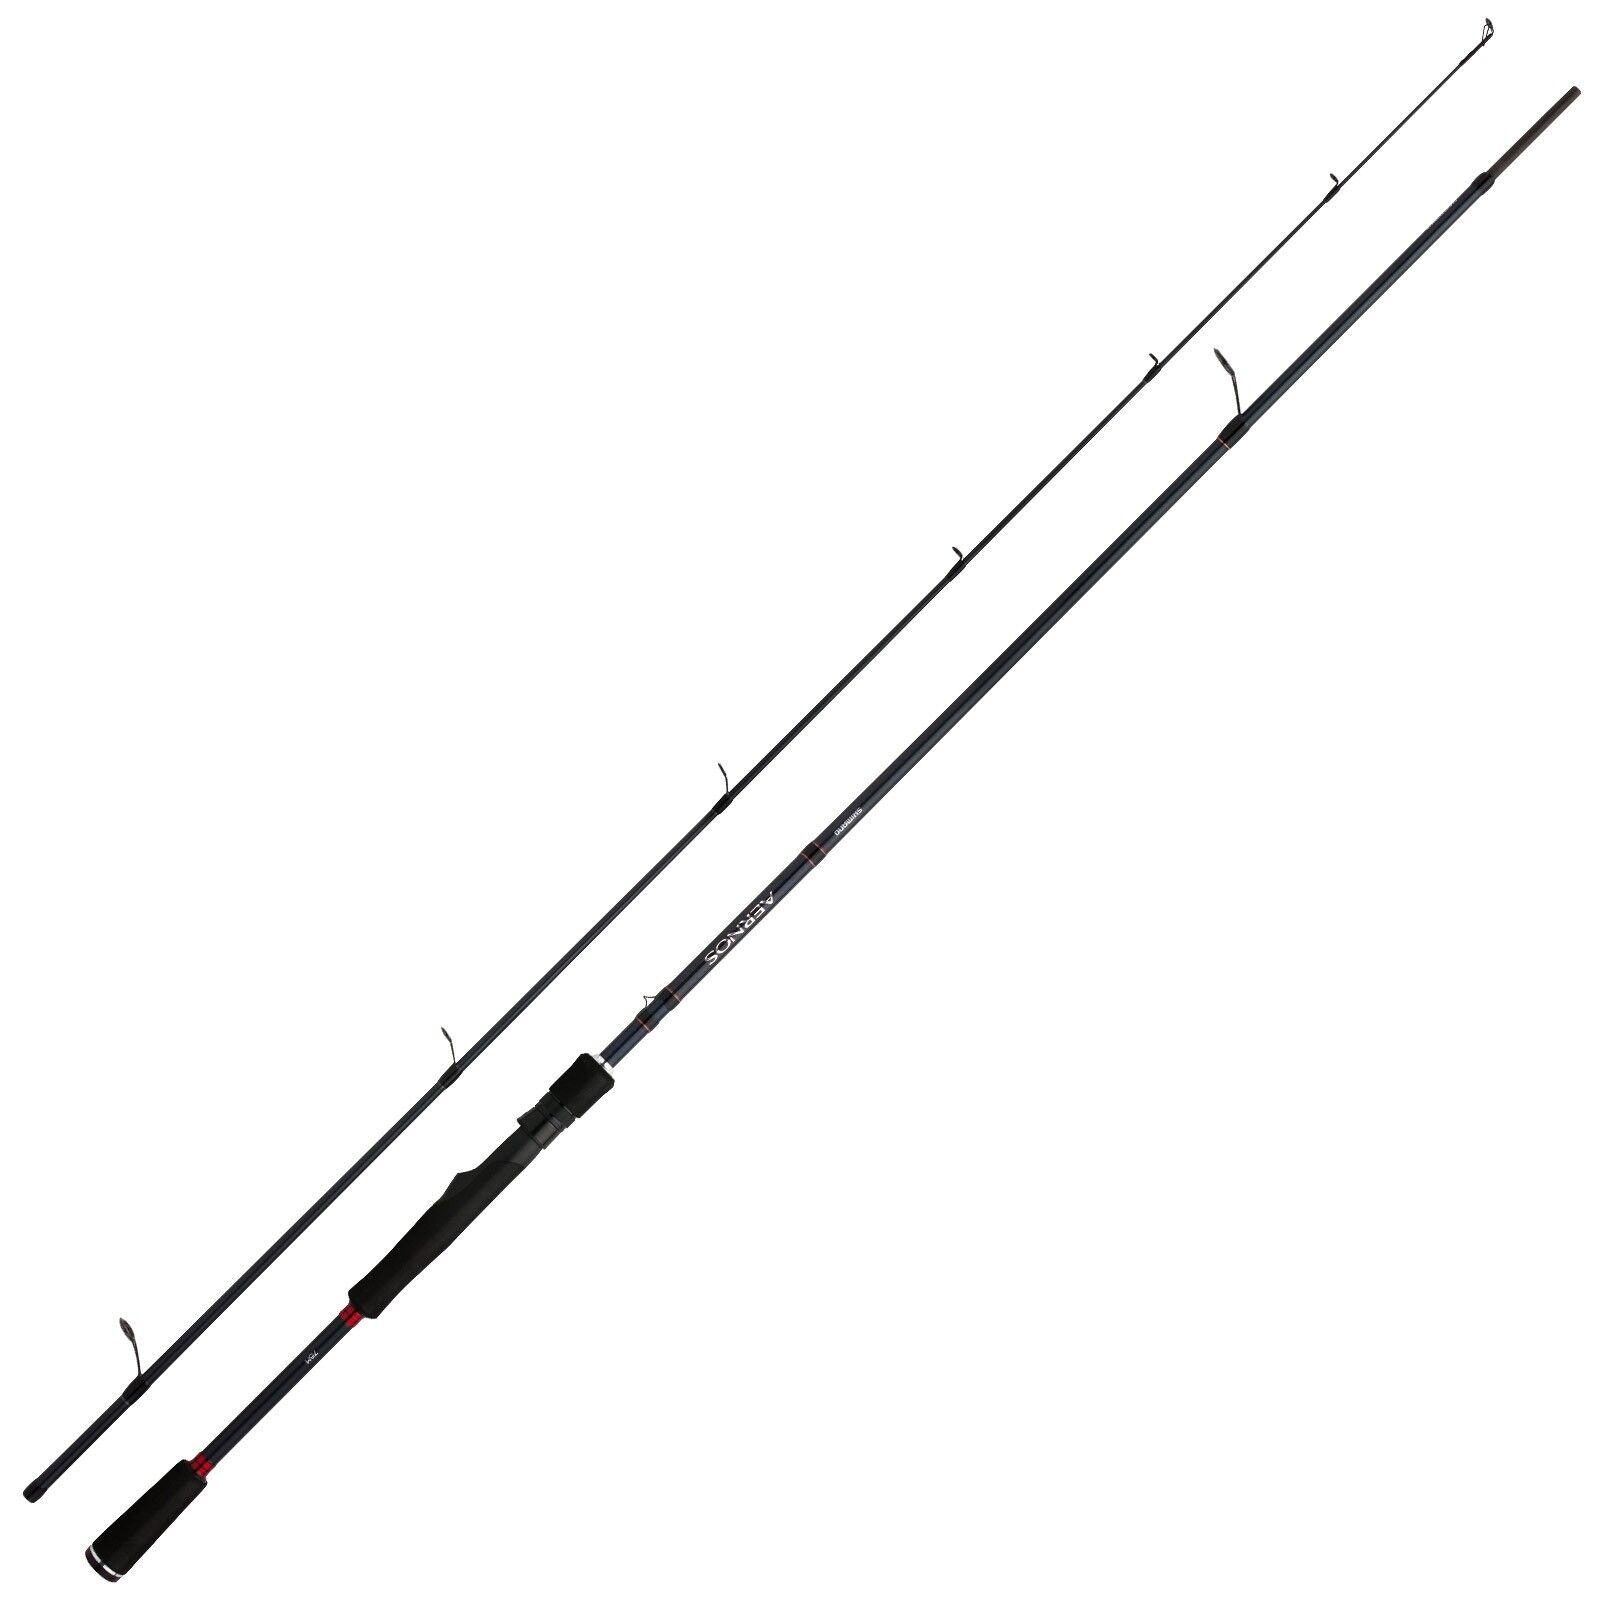 Shimano Canna da pesca AERNOS ax SPINNING 86xxh 2,59m 45135g